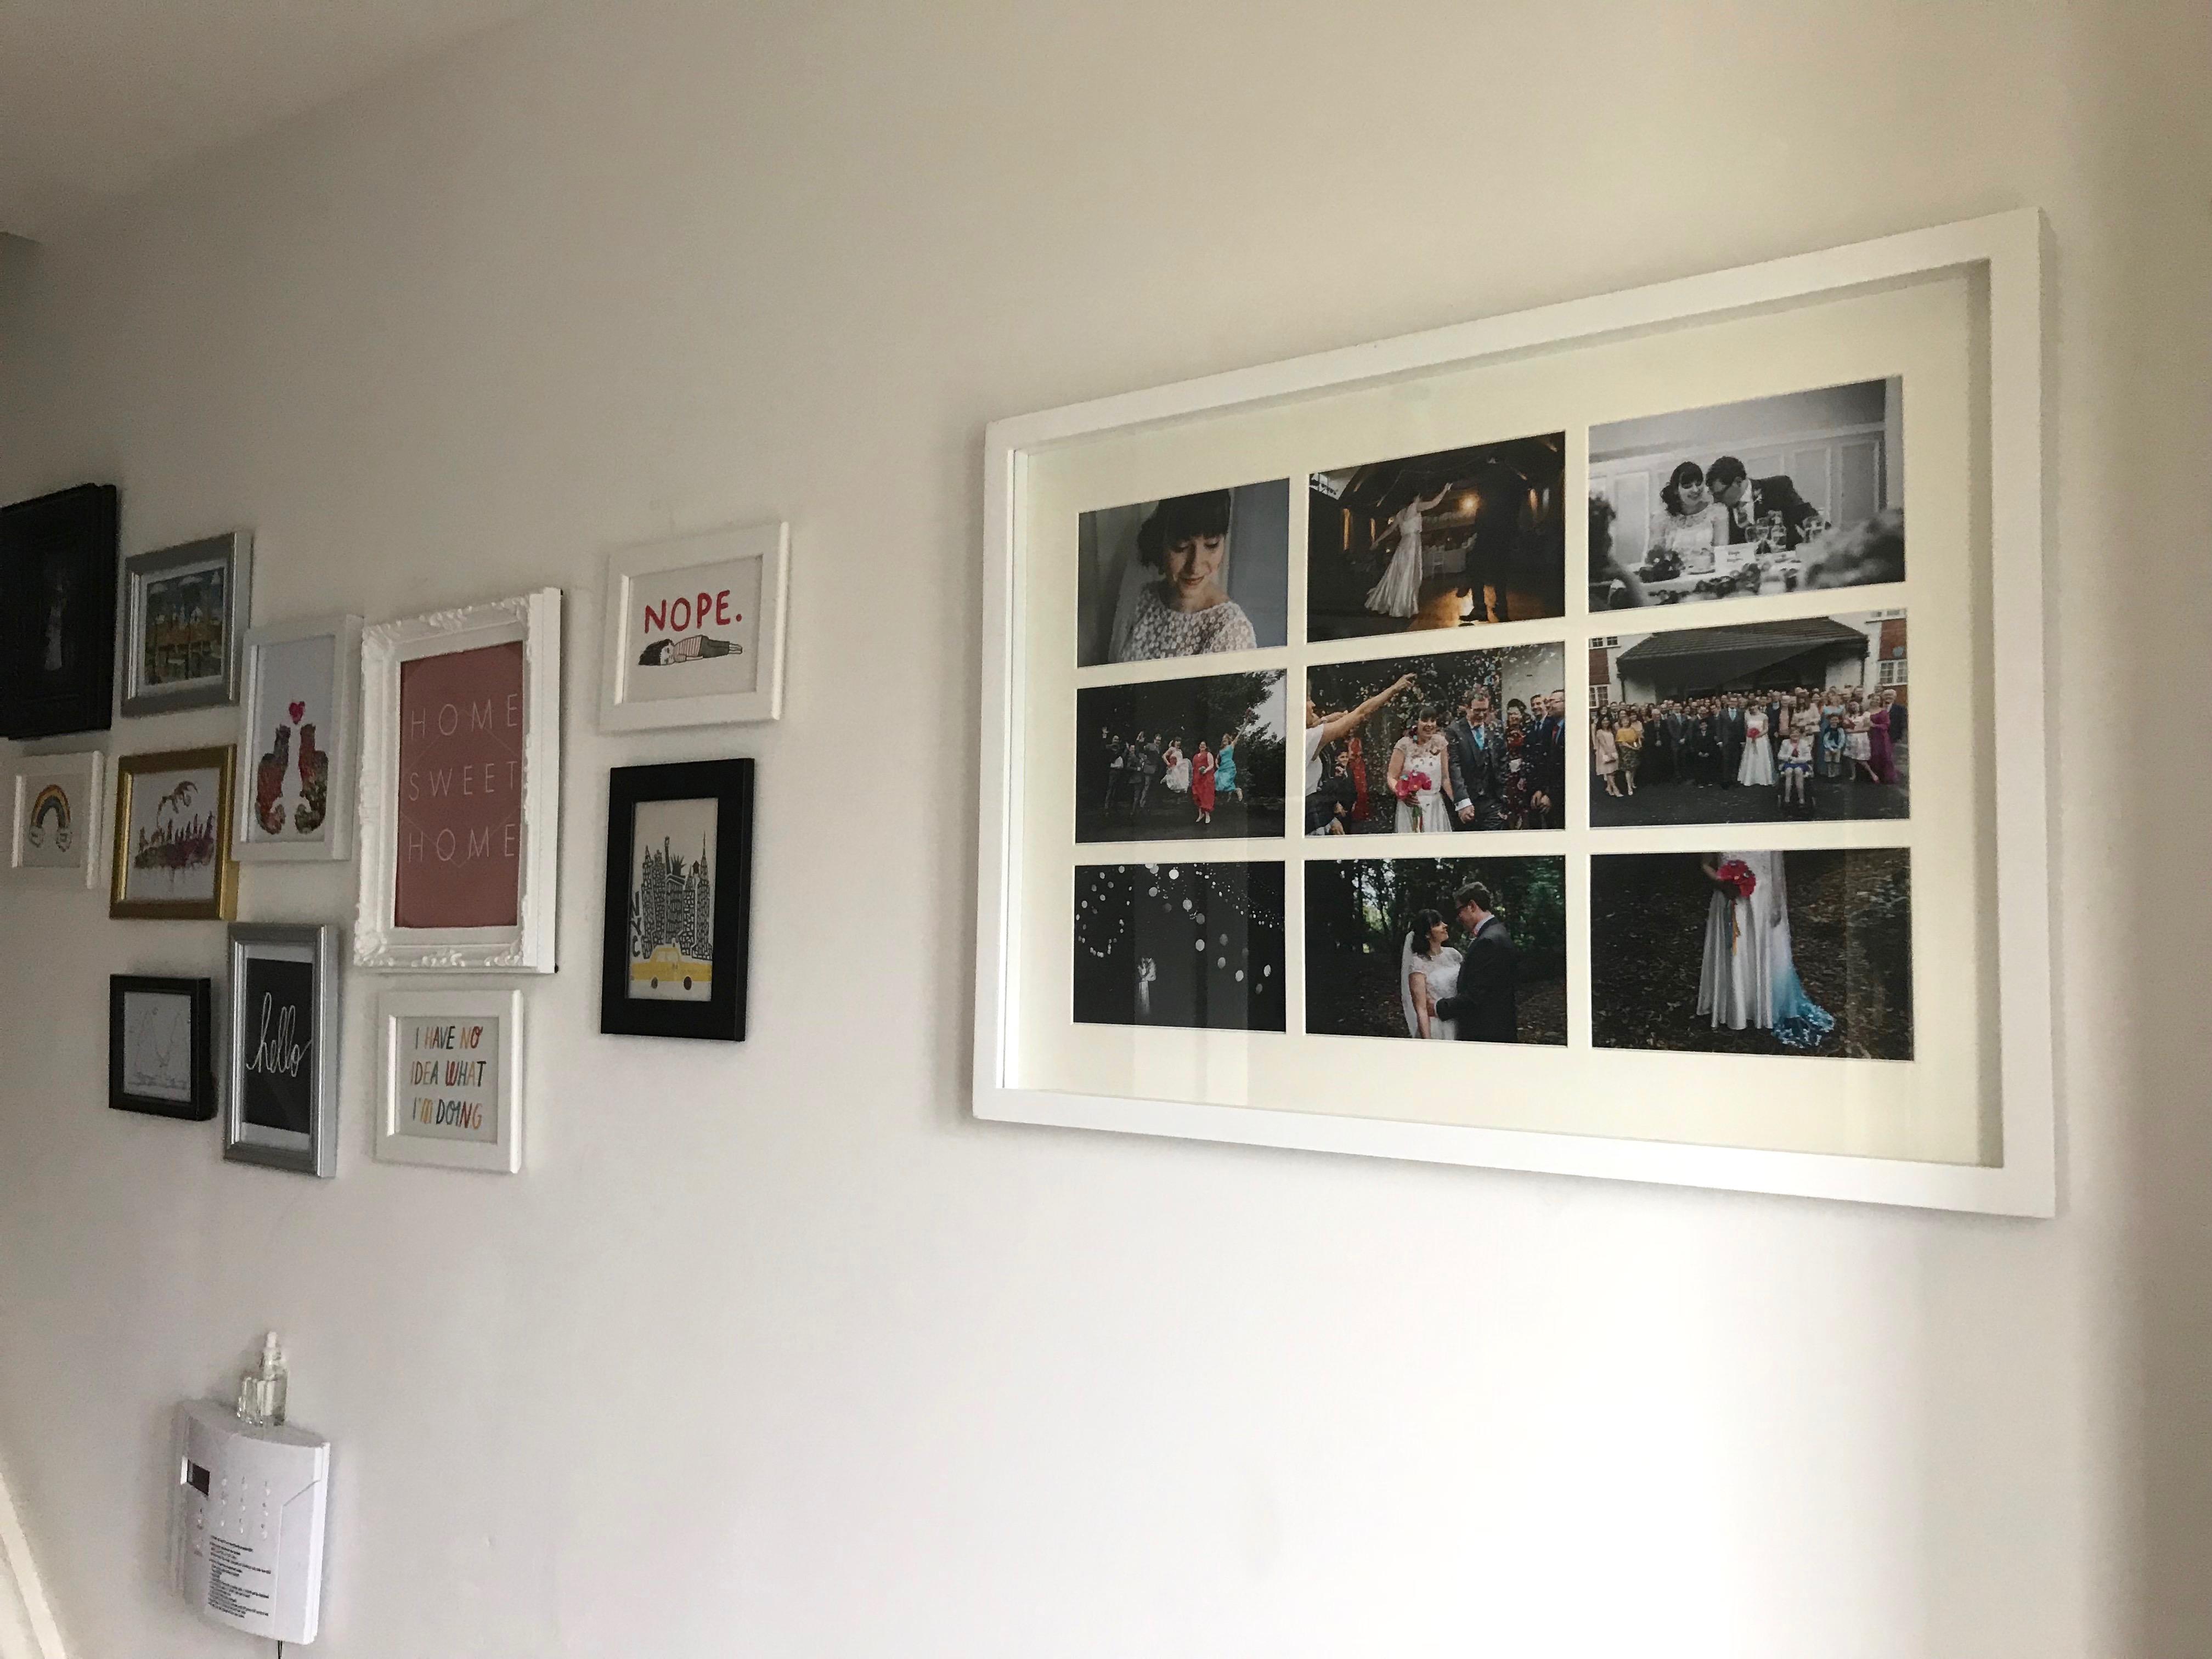 landing - gallery wall